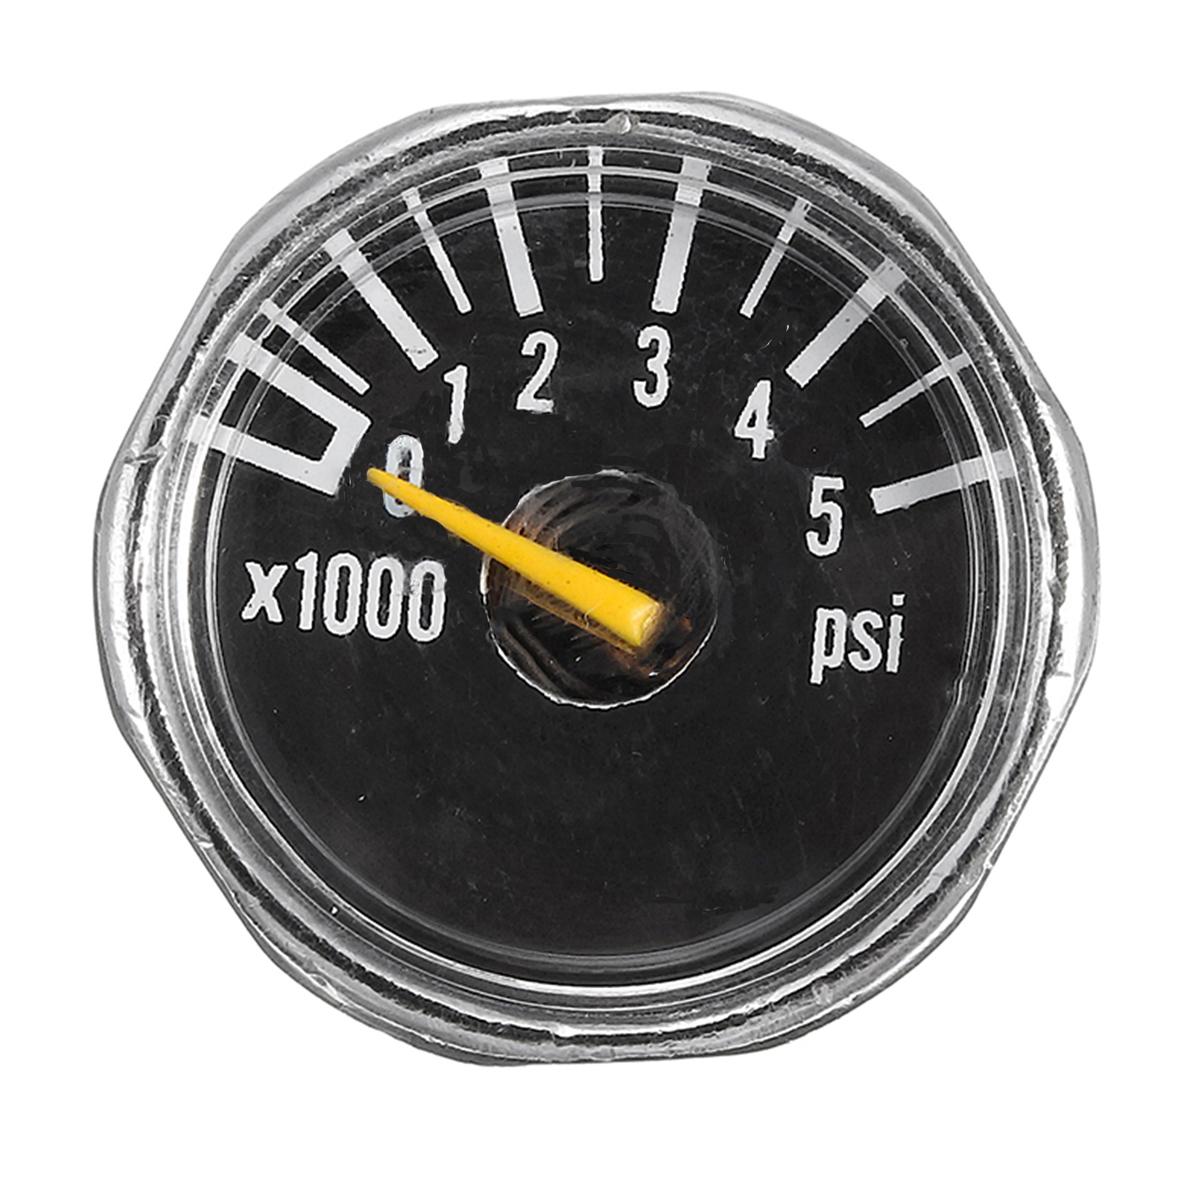 Микрометр 1 дюйм 25 мм от 0 до 5000psi Высокое давление для HPA Paintball Tank CO2 PCP